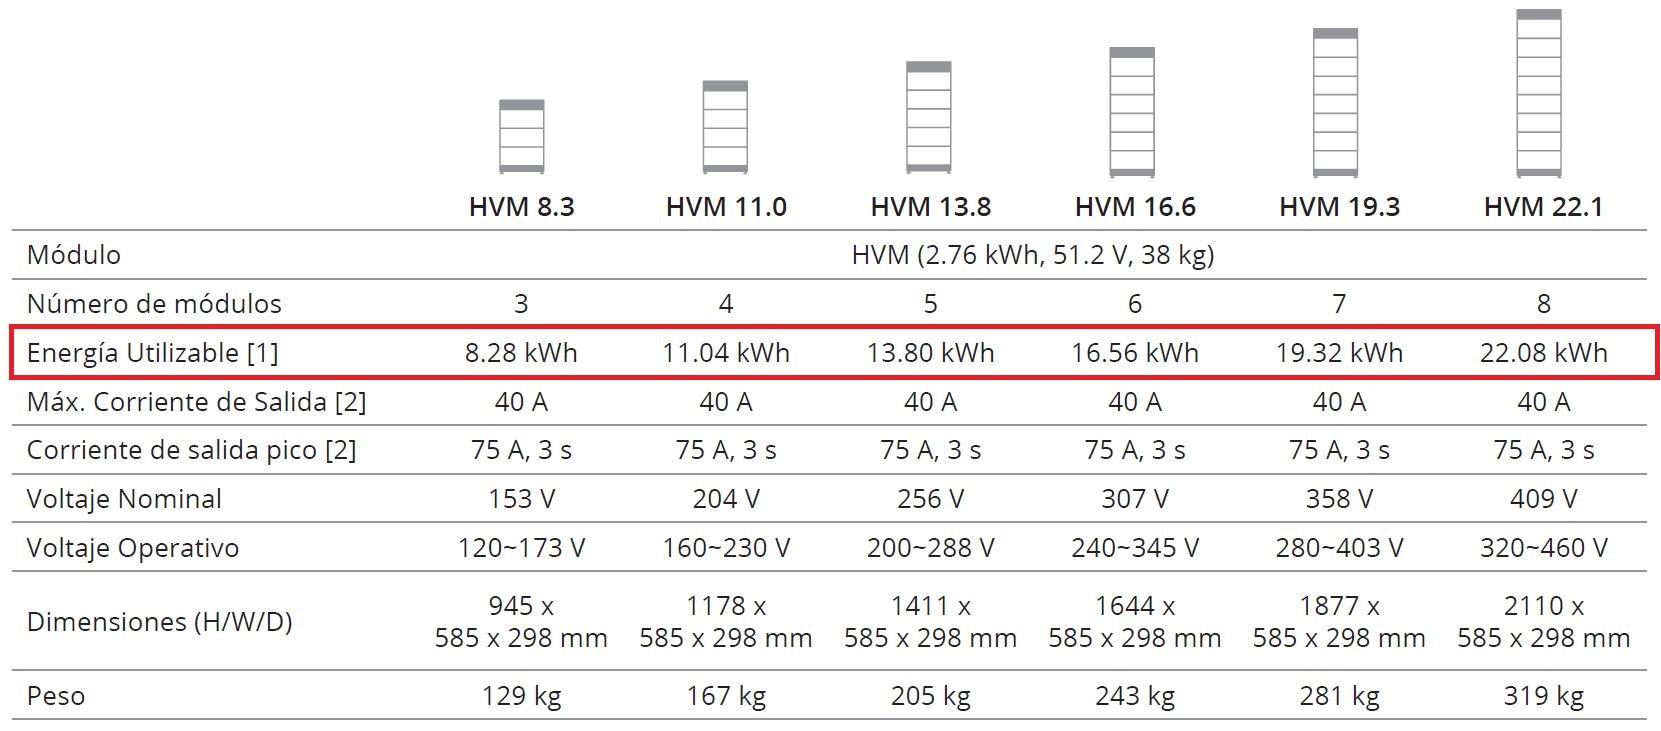 Batería Solar de Litio BYD HVM